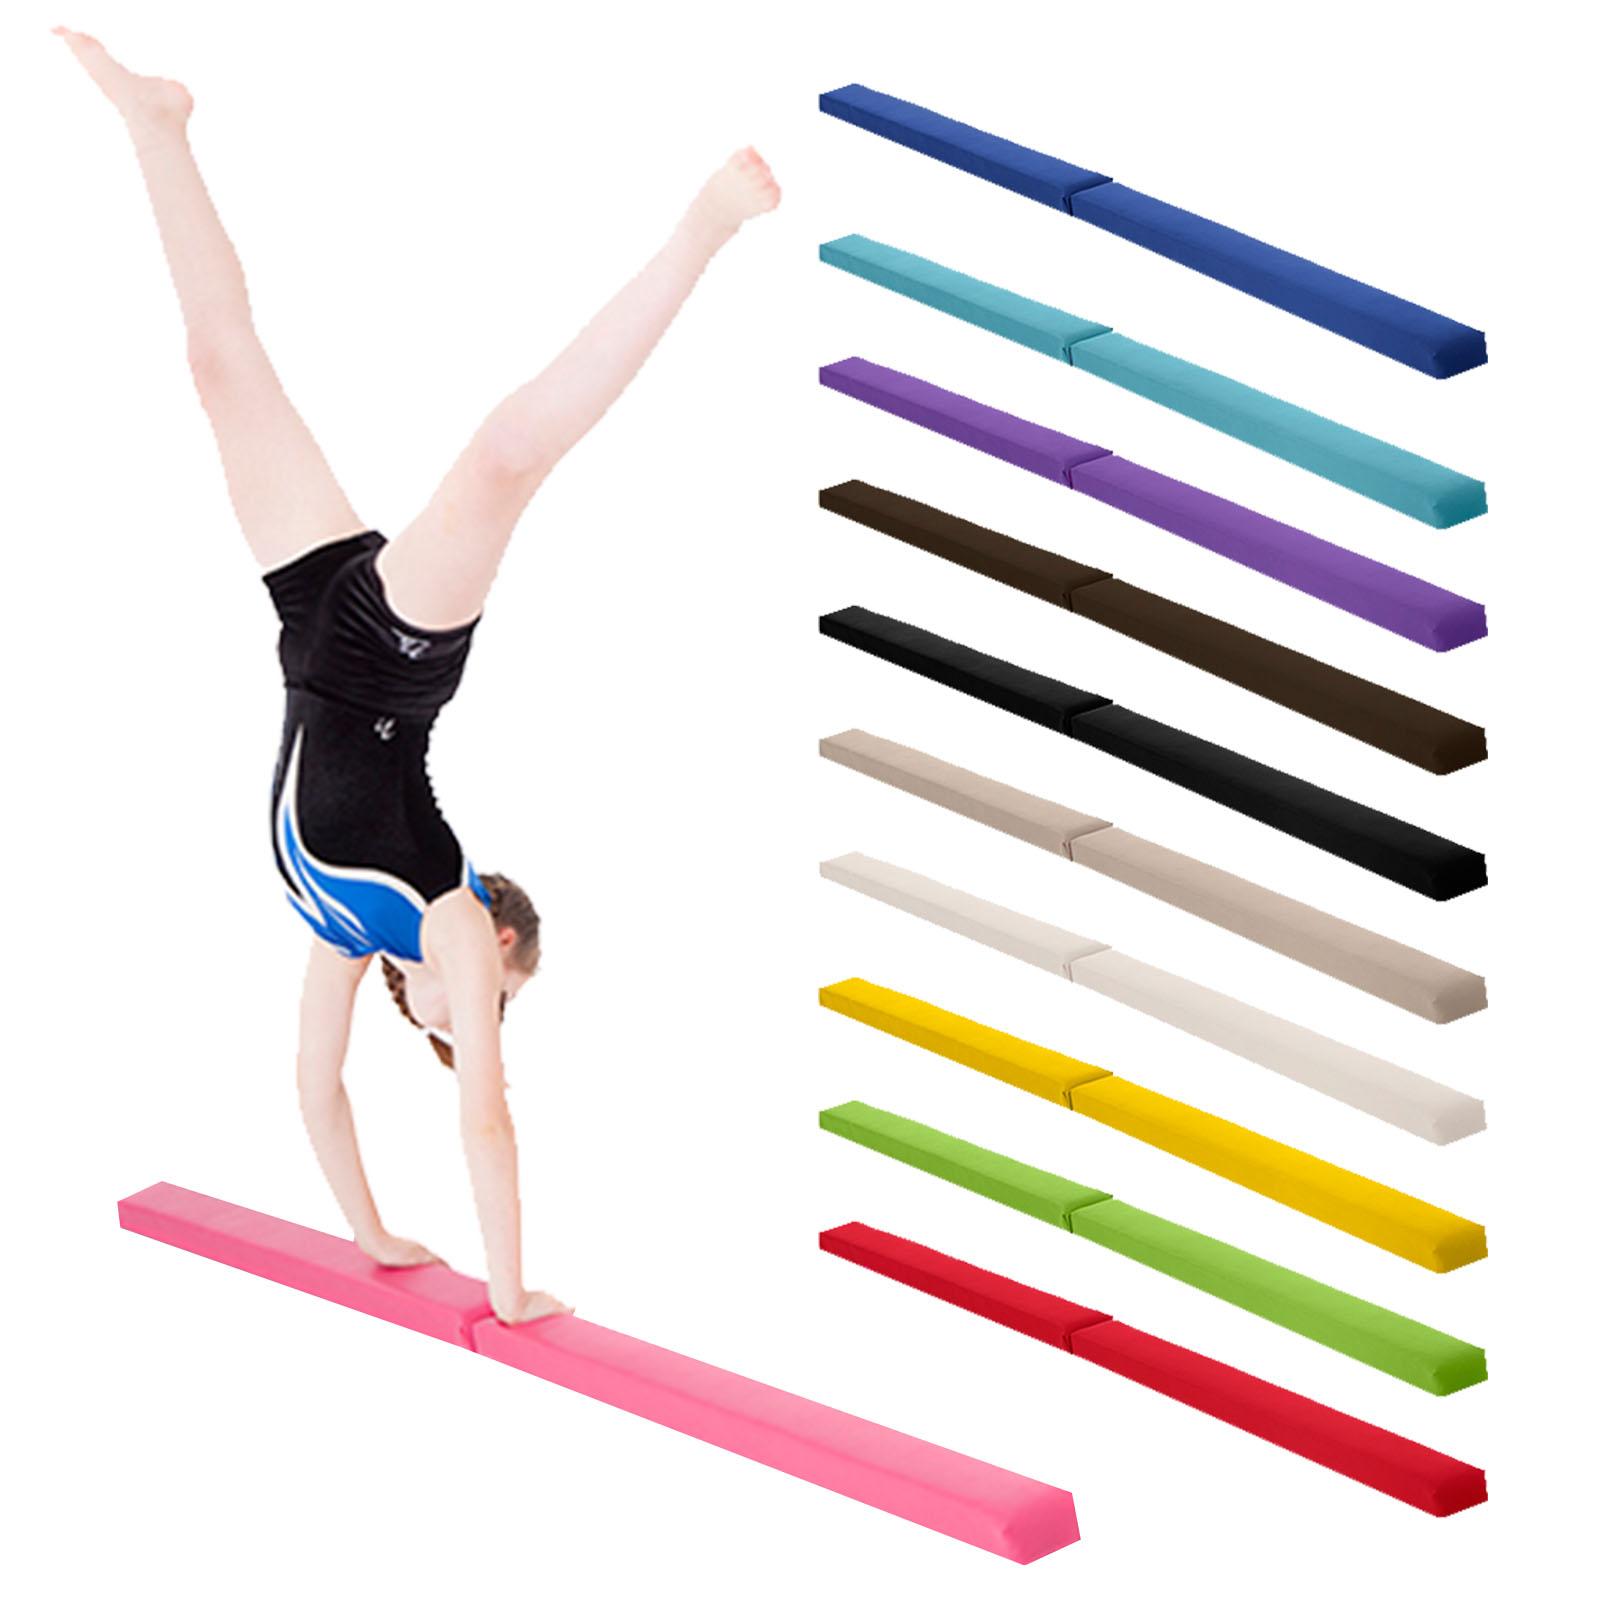 Gymnastics Folding Balance Beam 2 1m Hard Wearing Faux